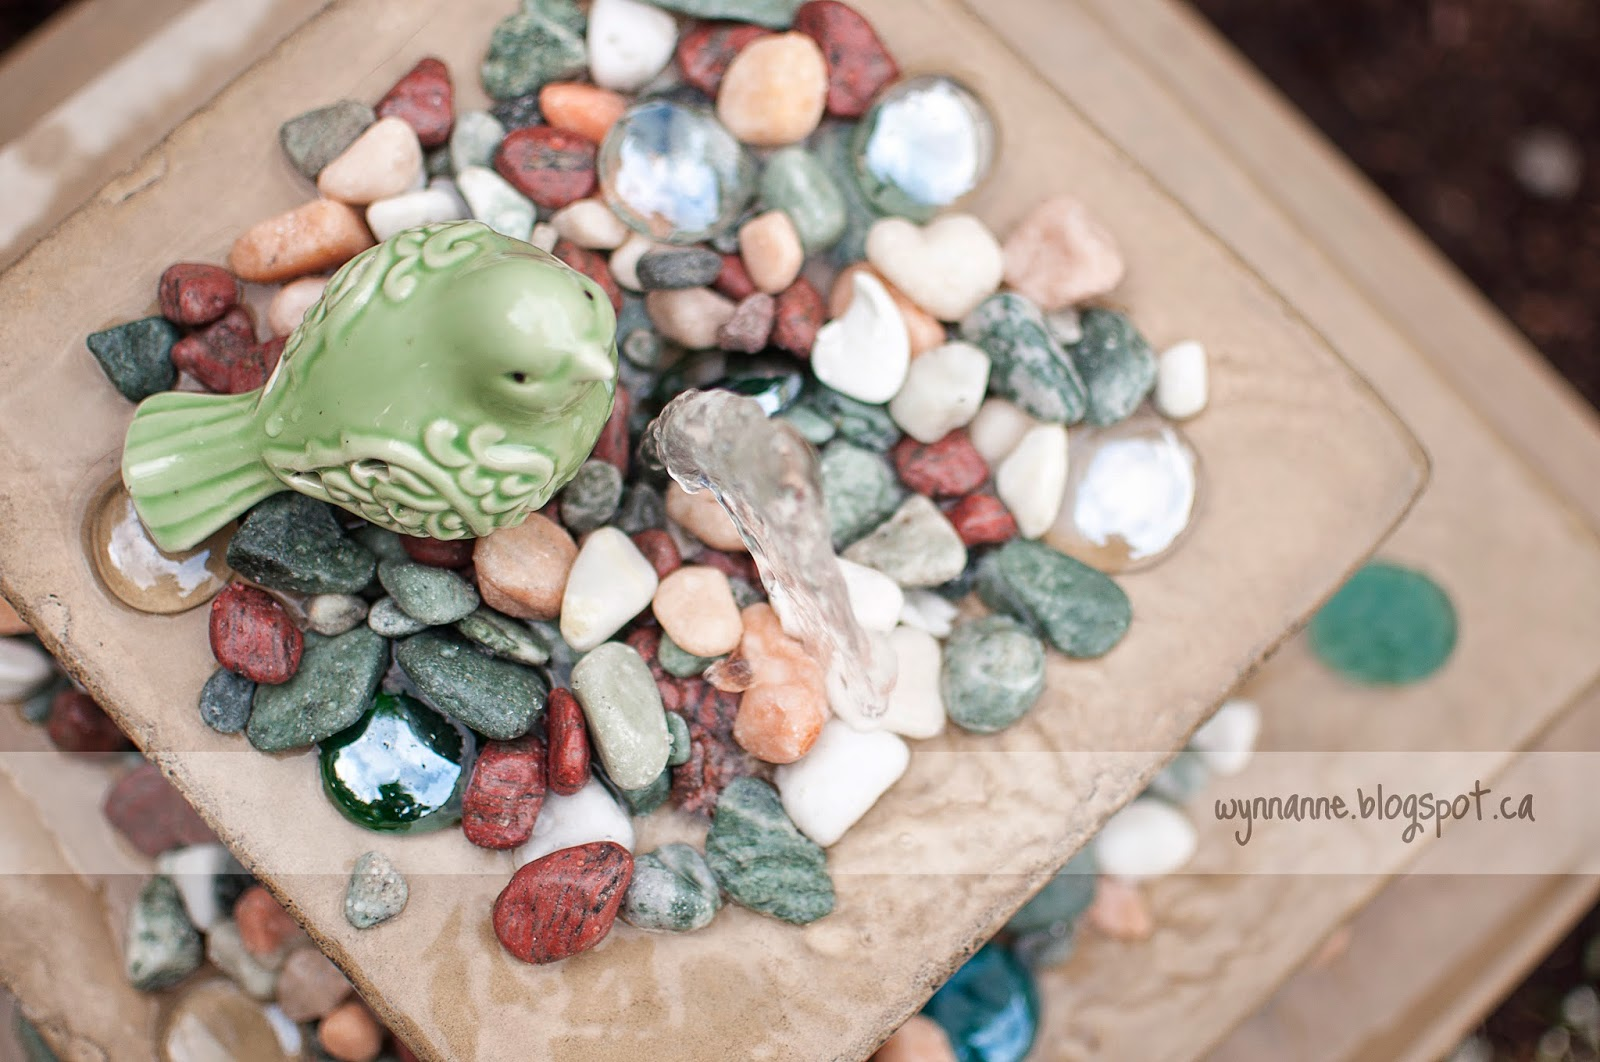 Making a Splash | Wynn Anne's Meanderings -- bird bath, fountain